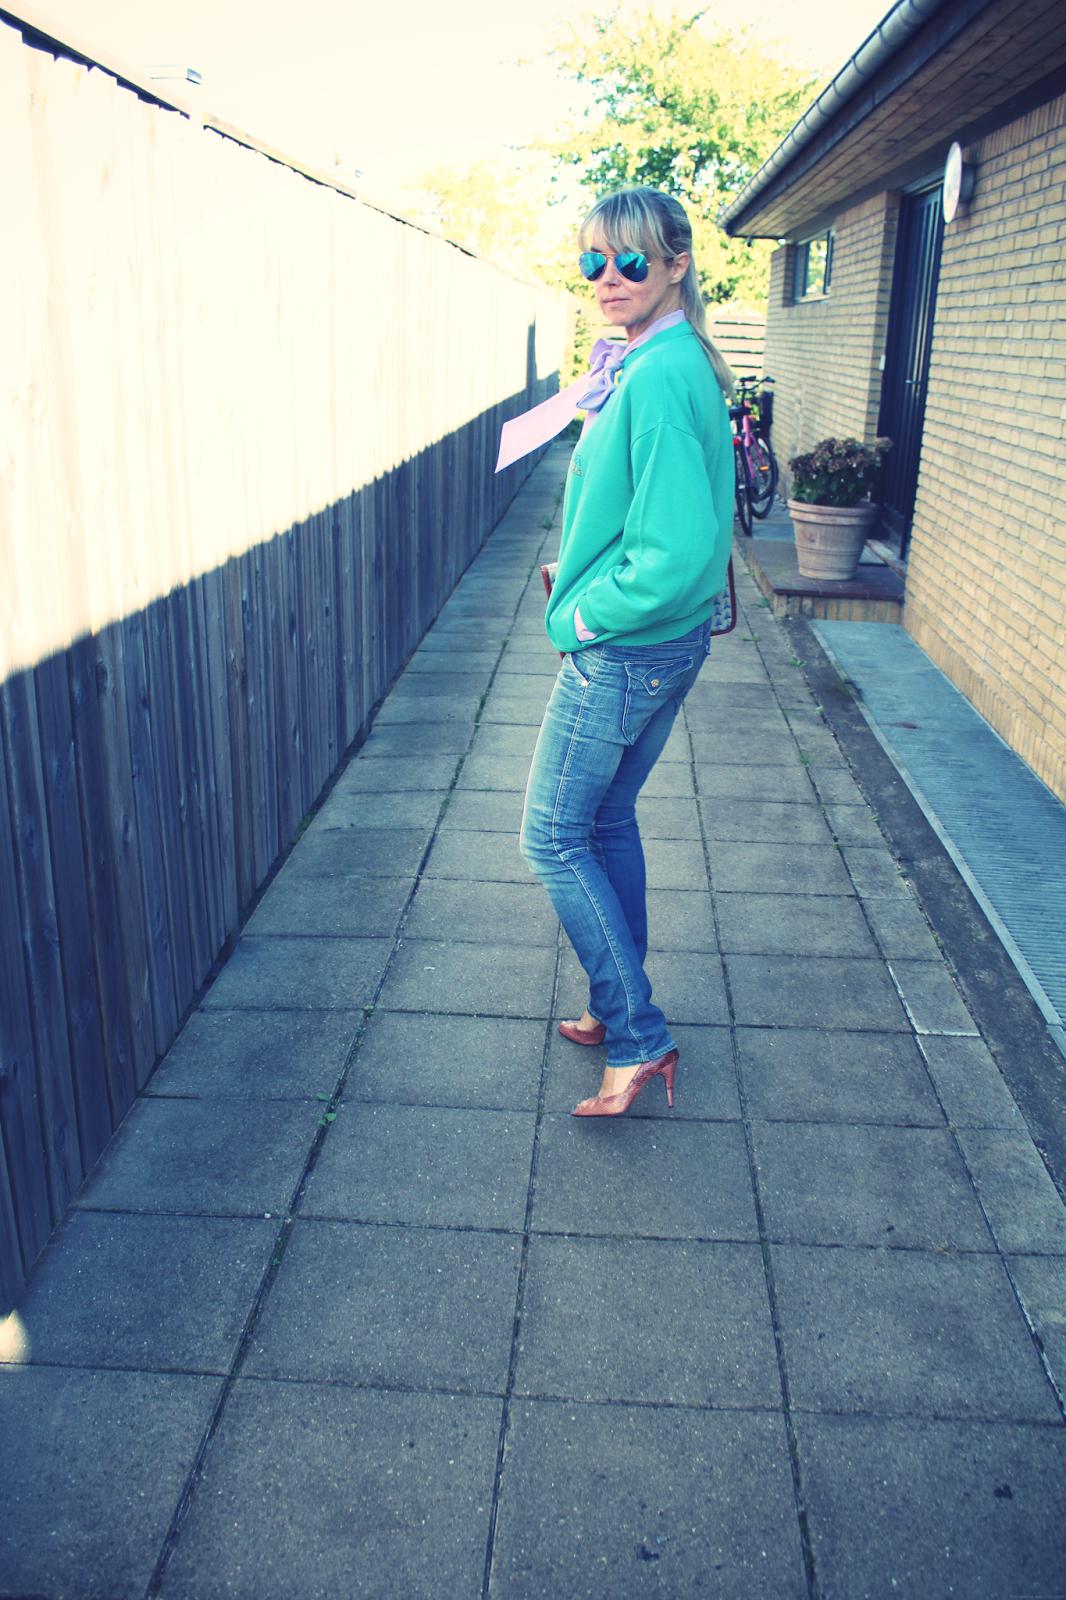 Citaten Angst Jeans : Eltoft vintage jeans anxiety